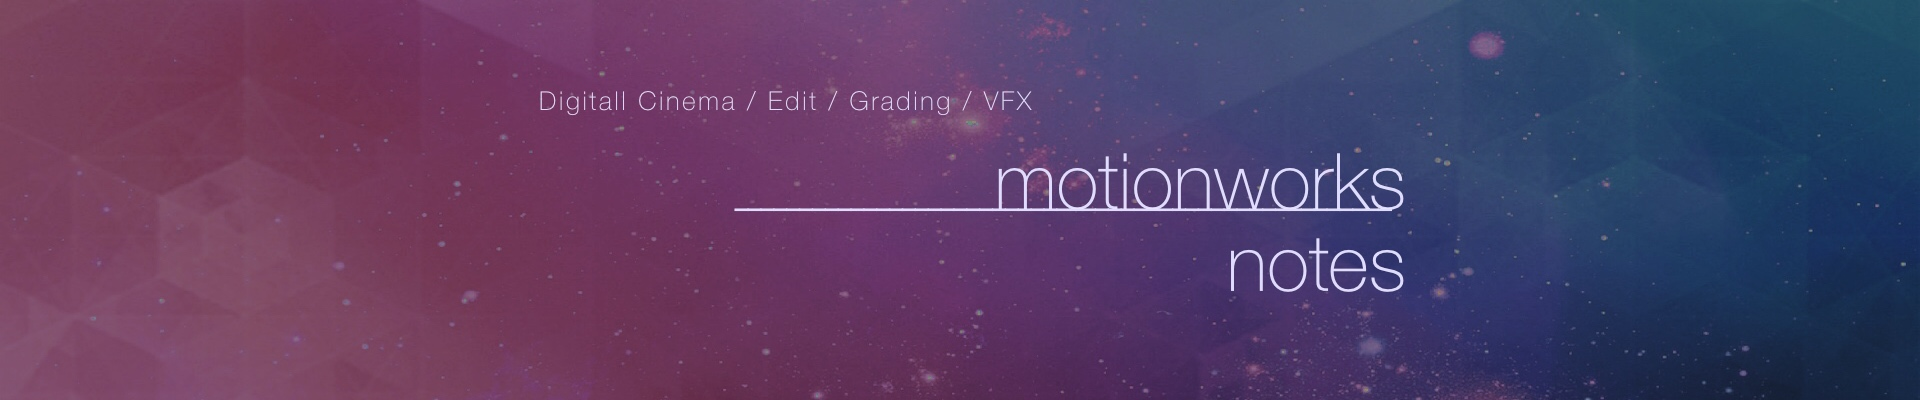 motionworks note store